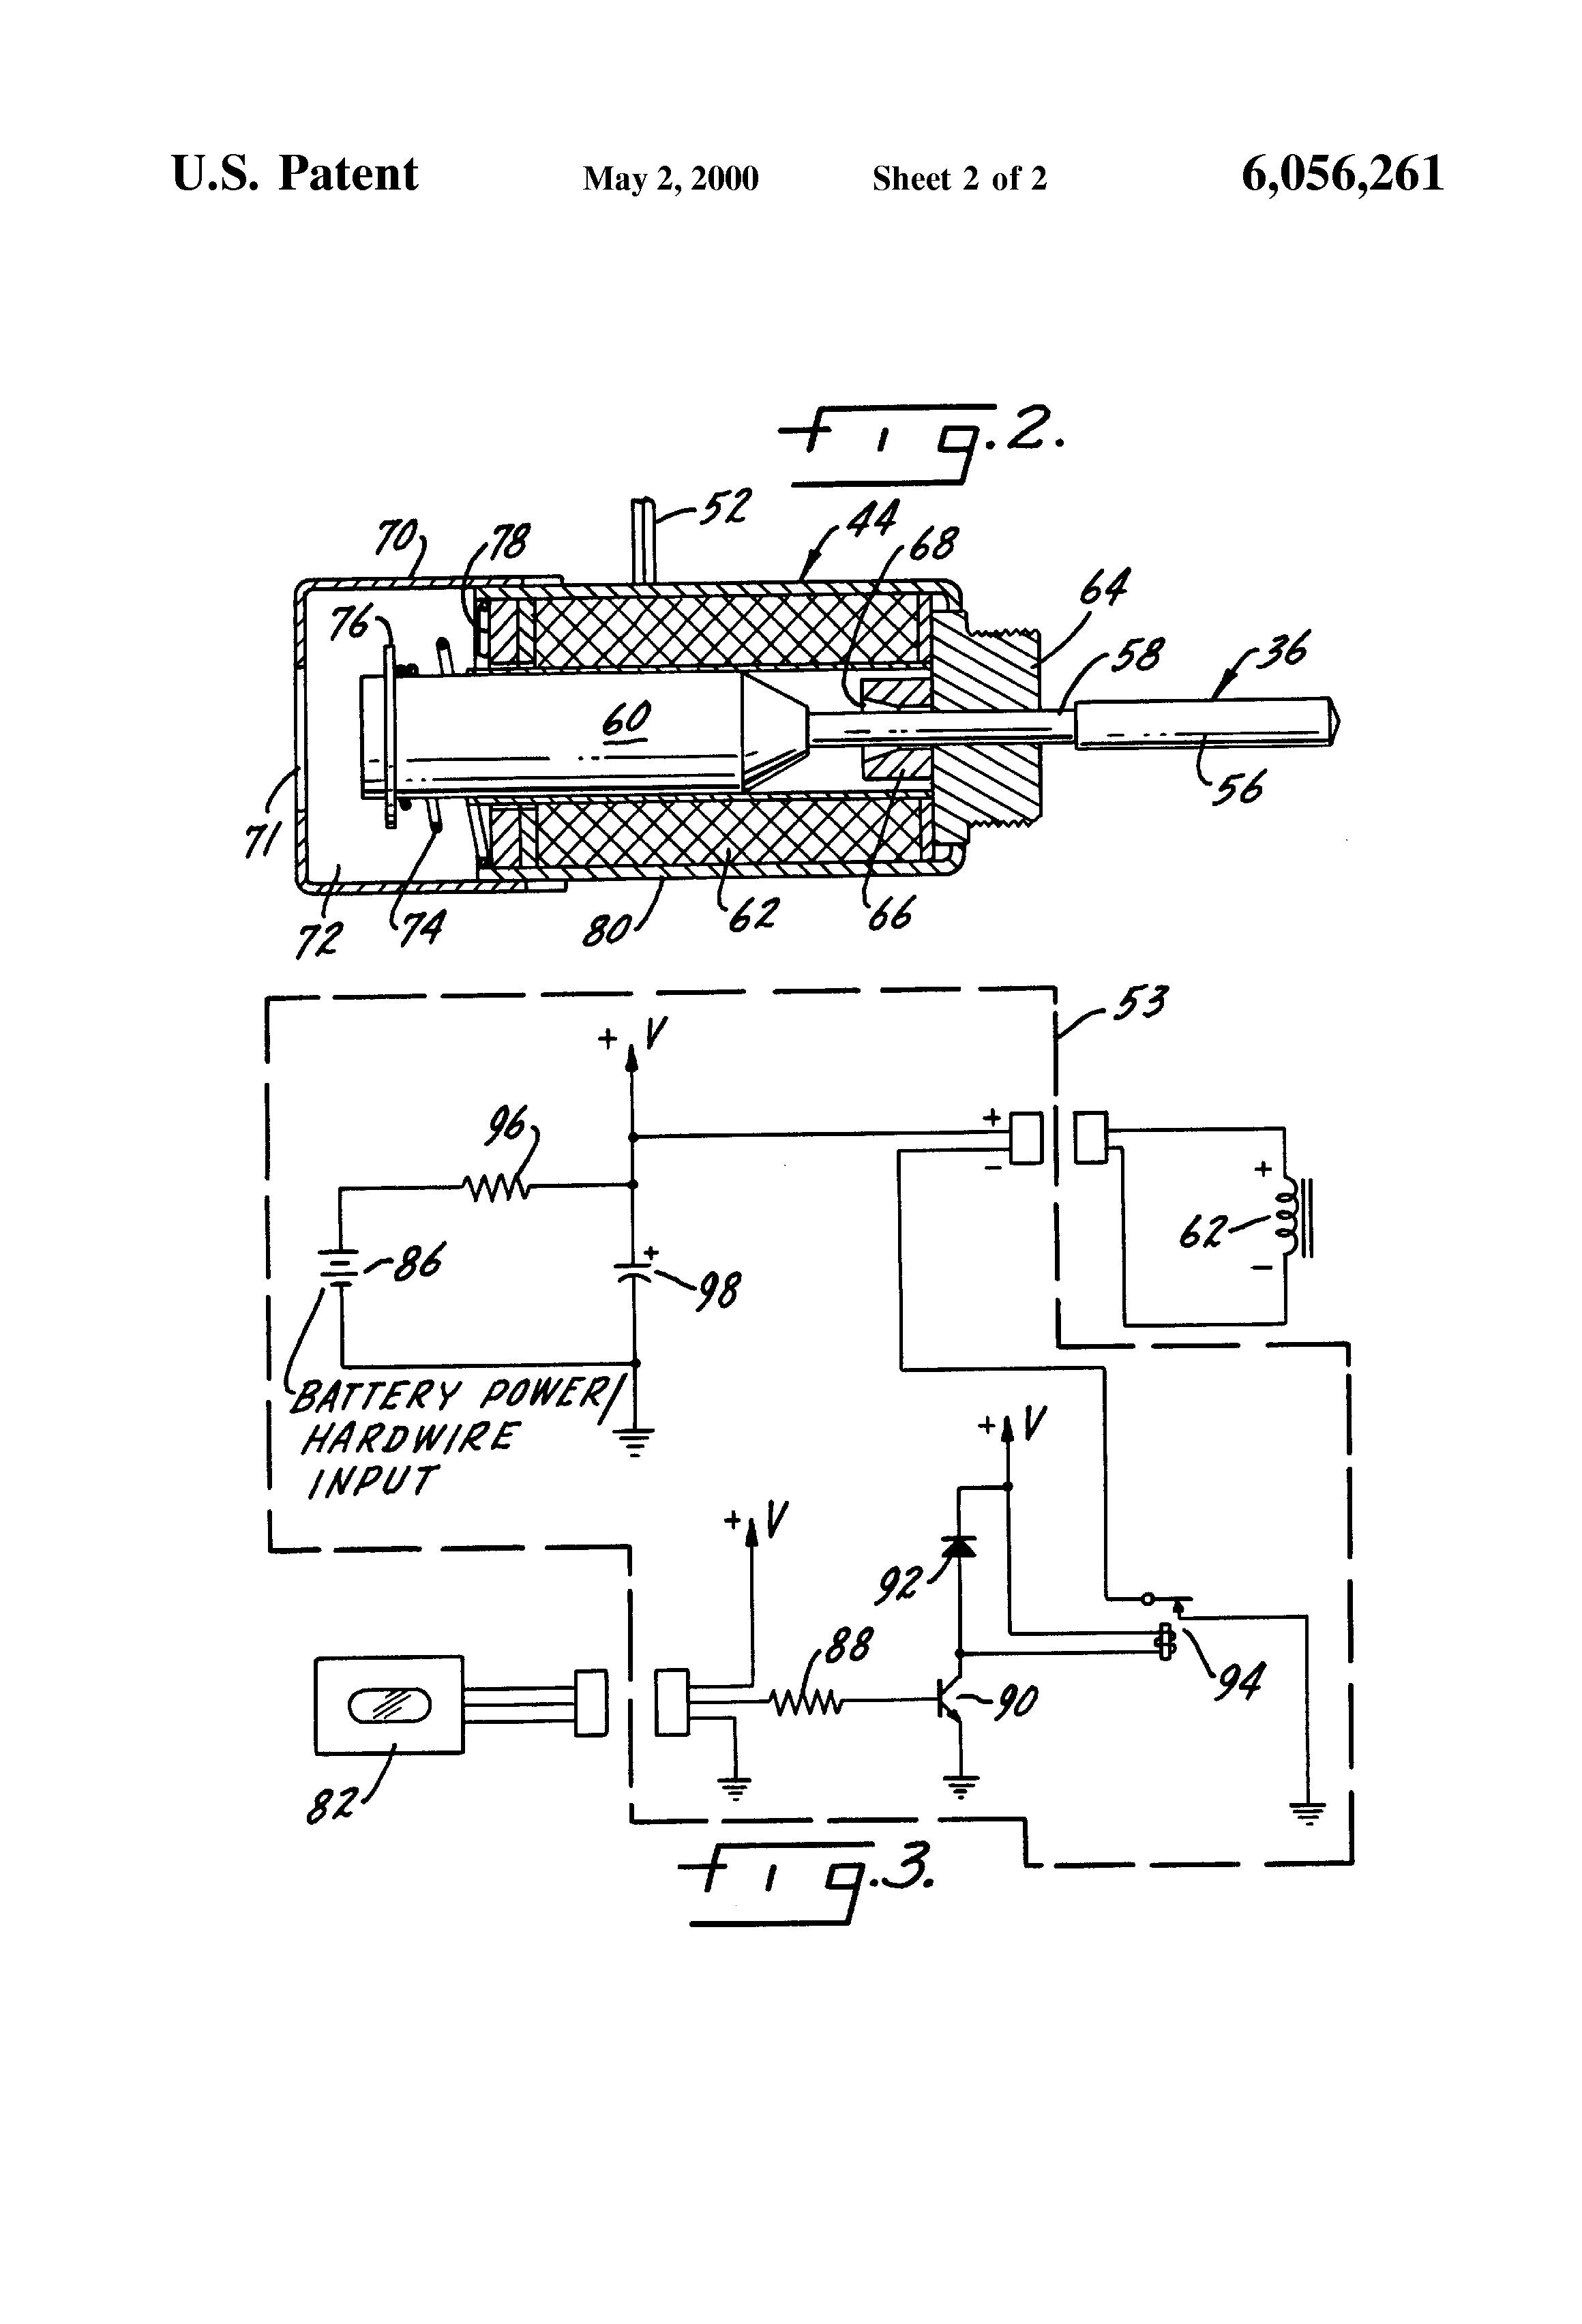 Ideas, sloan sensor faucet solenoid sloan sensor faucet solenoid patent us6056261 sensor operated solenoid direct drive flush 2320 x 3408  .